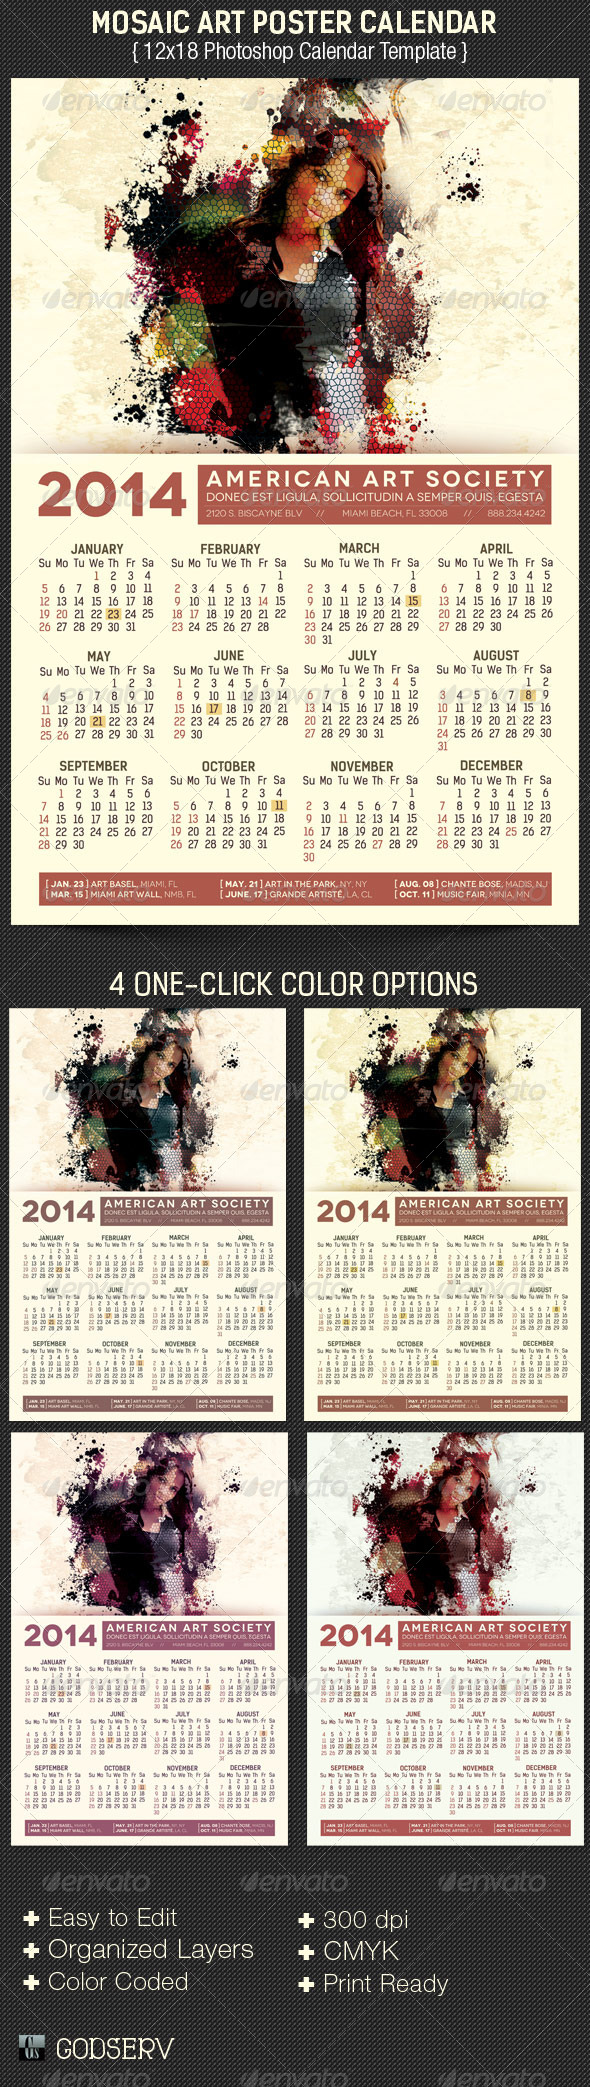 GraphicRiver Mosaic Art Poster Calendar Template 5086574